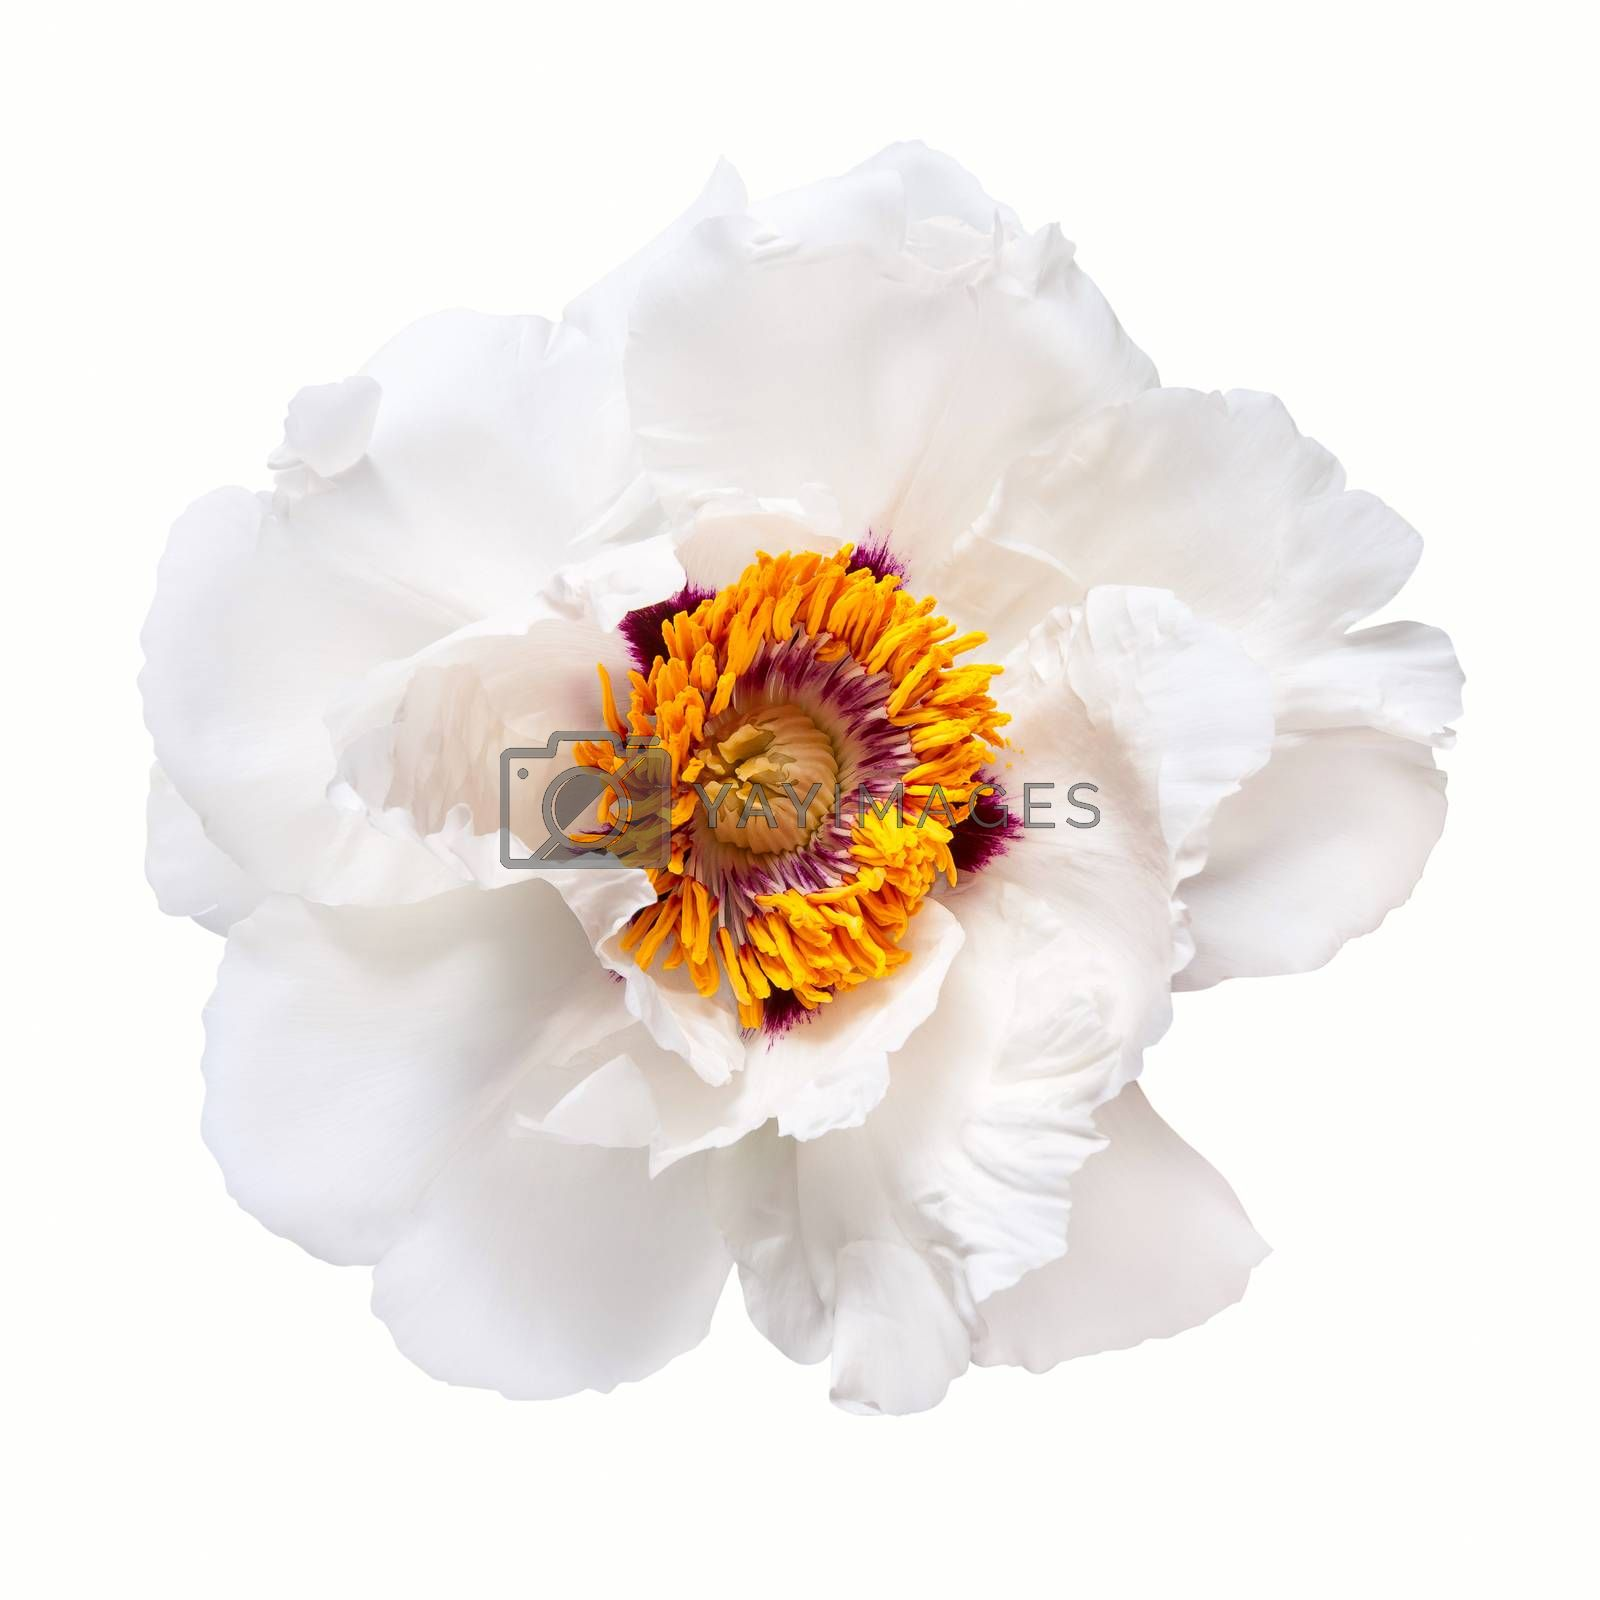 White peony flower isolated on white background, spa aroma